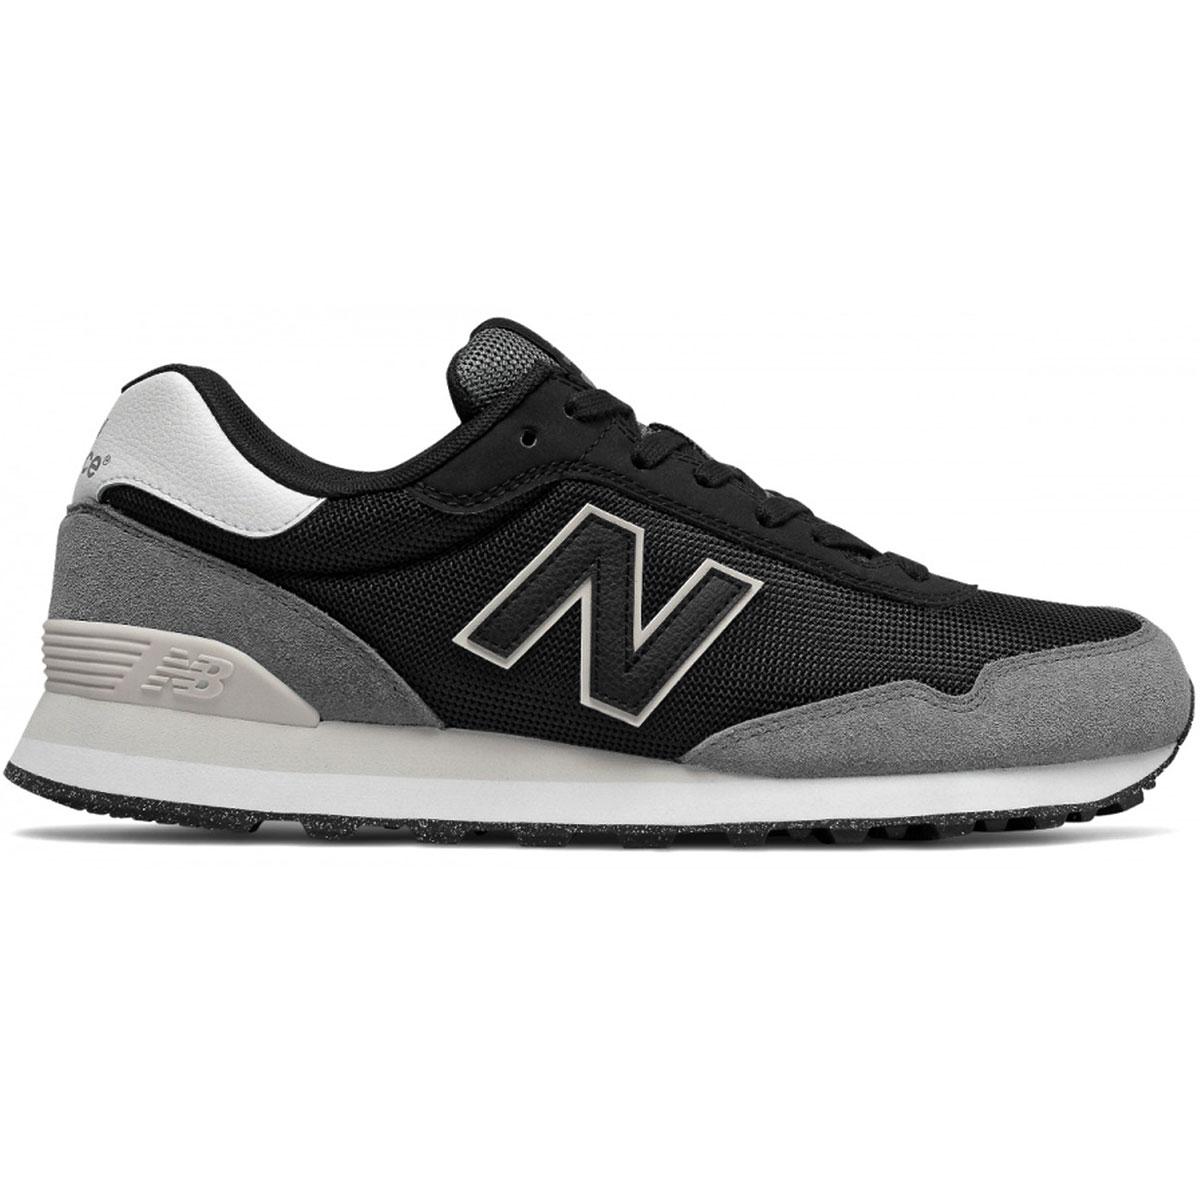 New Balance ML515OTZ Sneaker schwarz grau